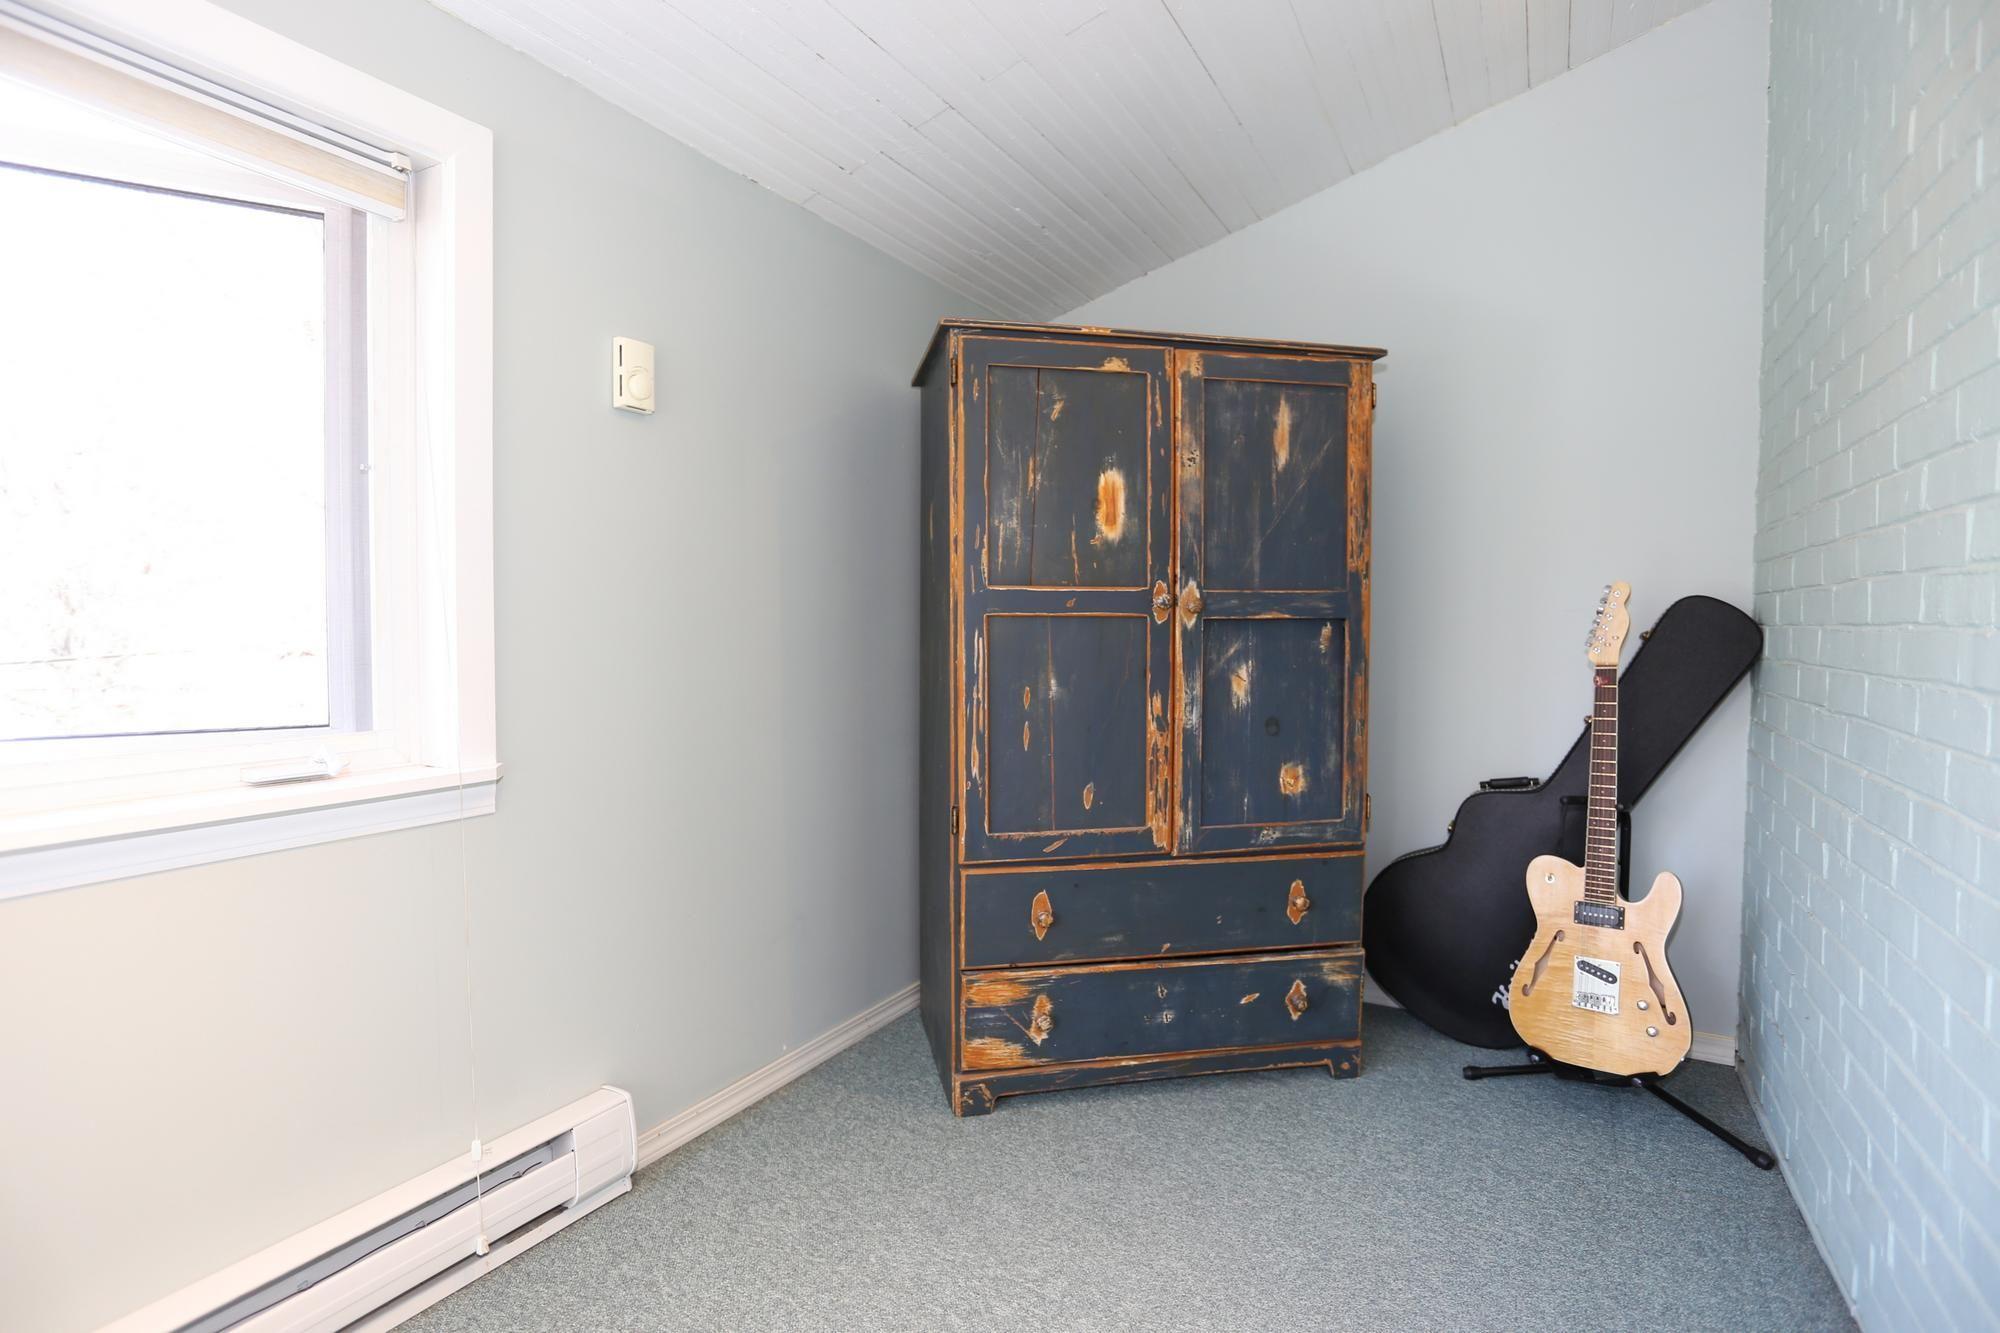 Photo 19: Photos: 96 Home Street in Winnipeg: Wolseley Single Family Detached for sale (5B)  : MLS®# 1810985